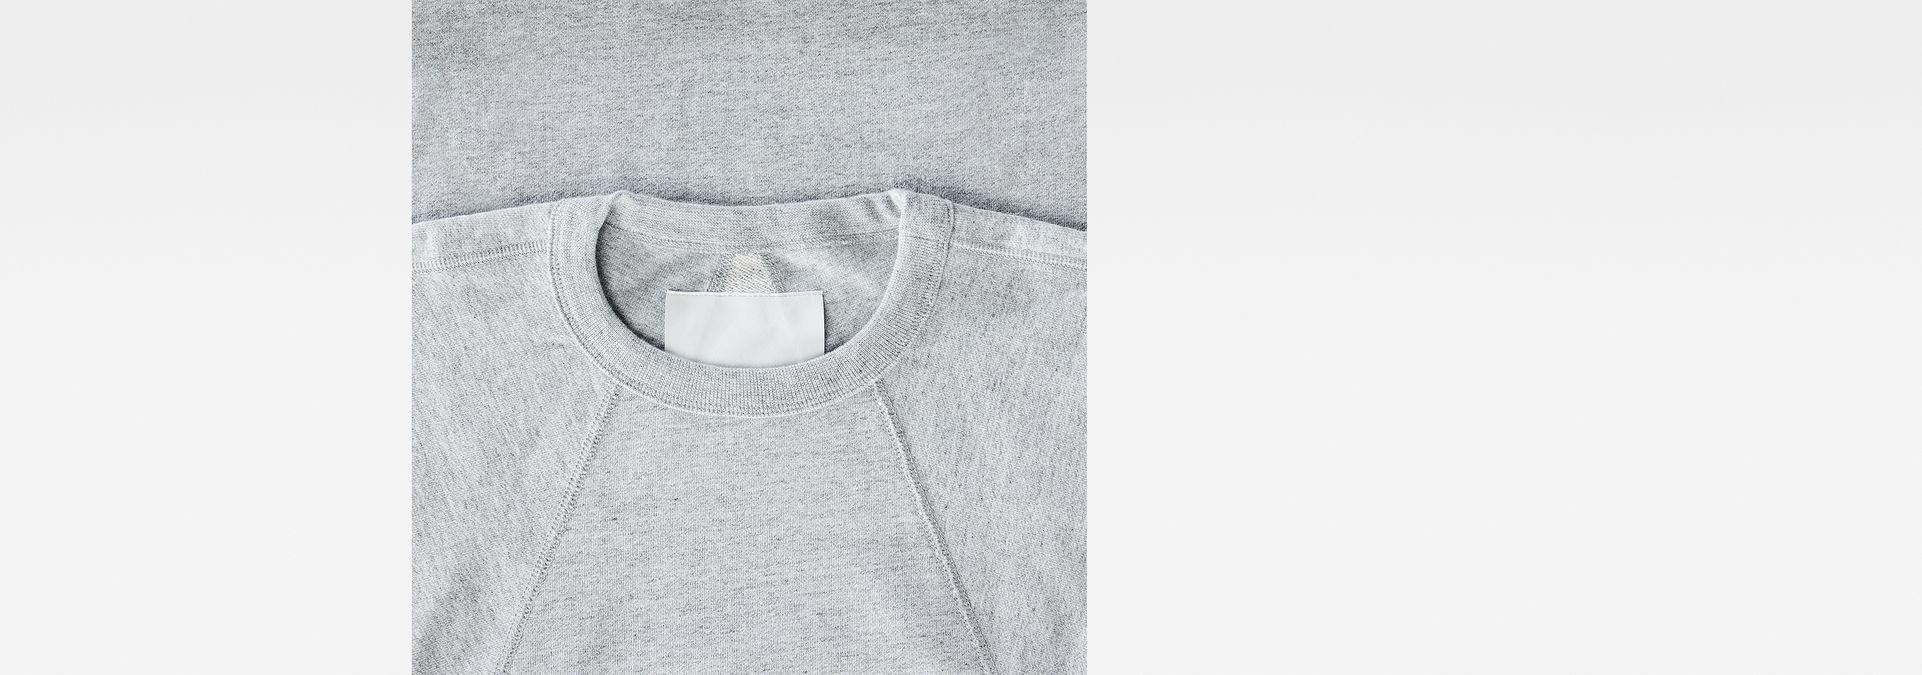 Marc Newson Leather Patch Sweater   Grey Heather   G Star RAW®